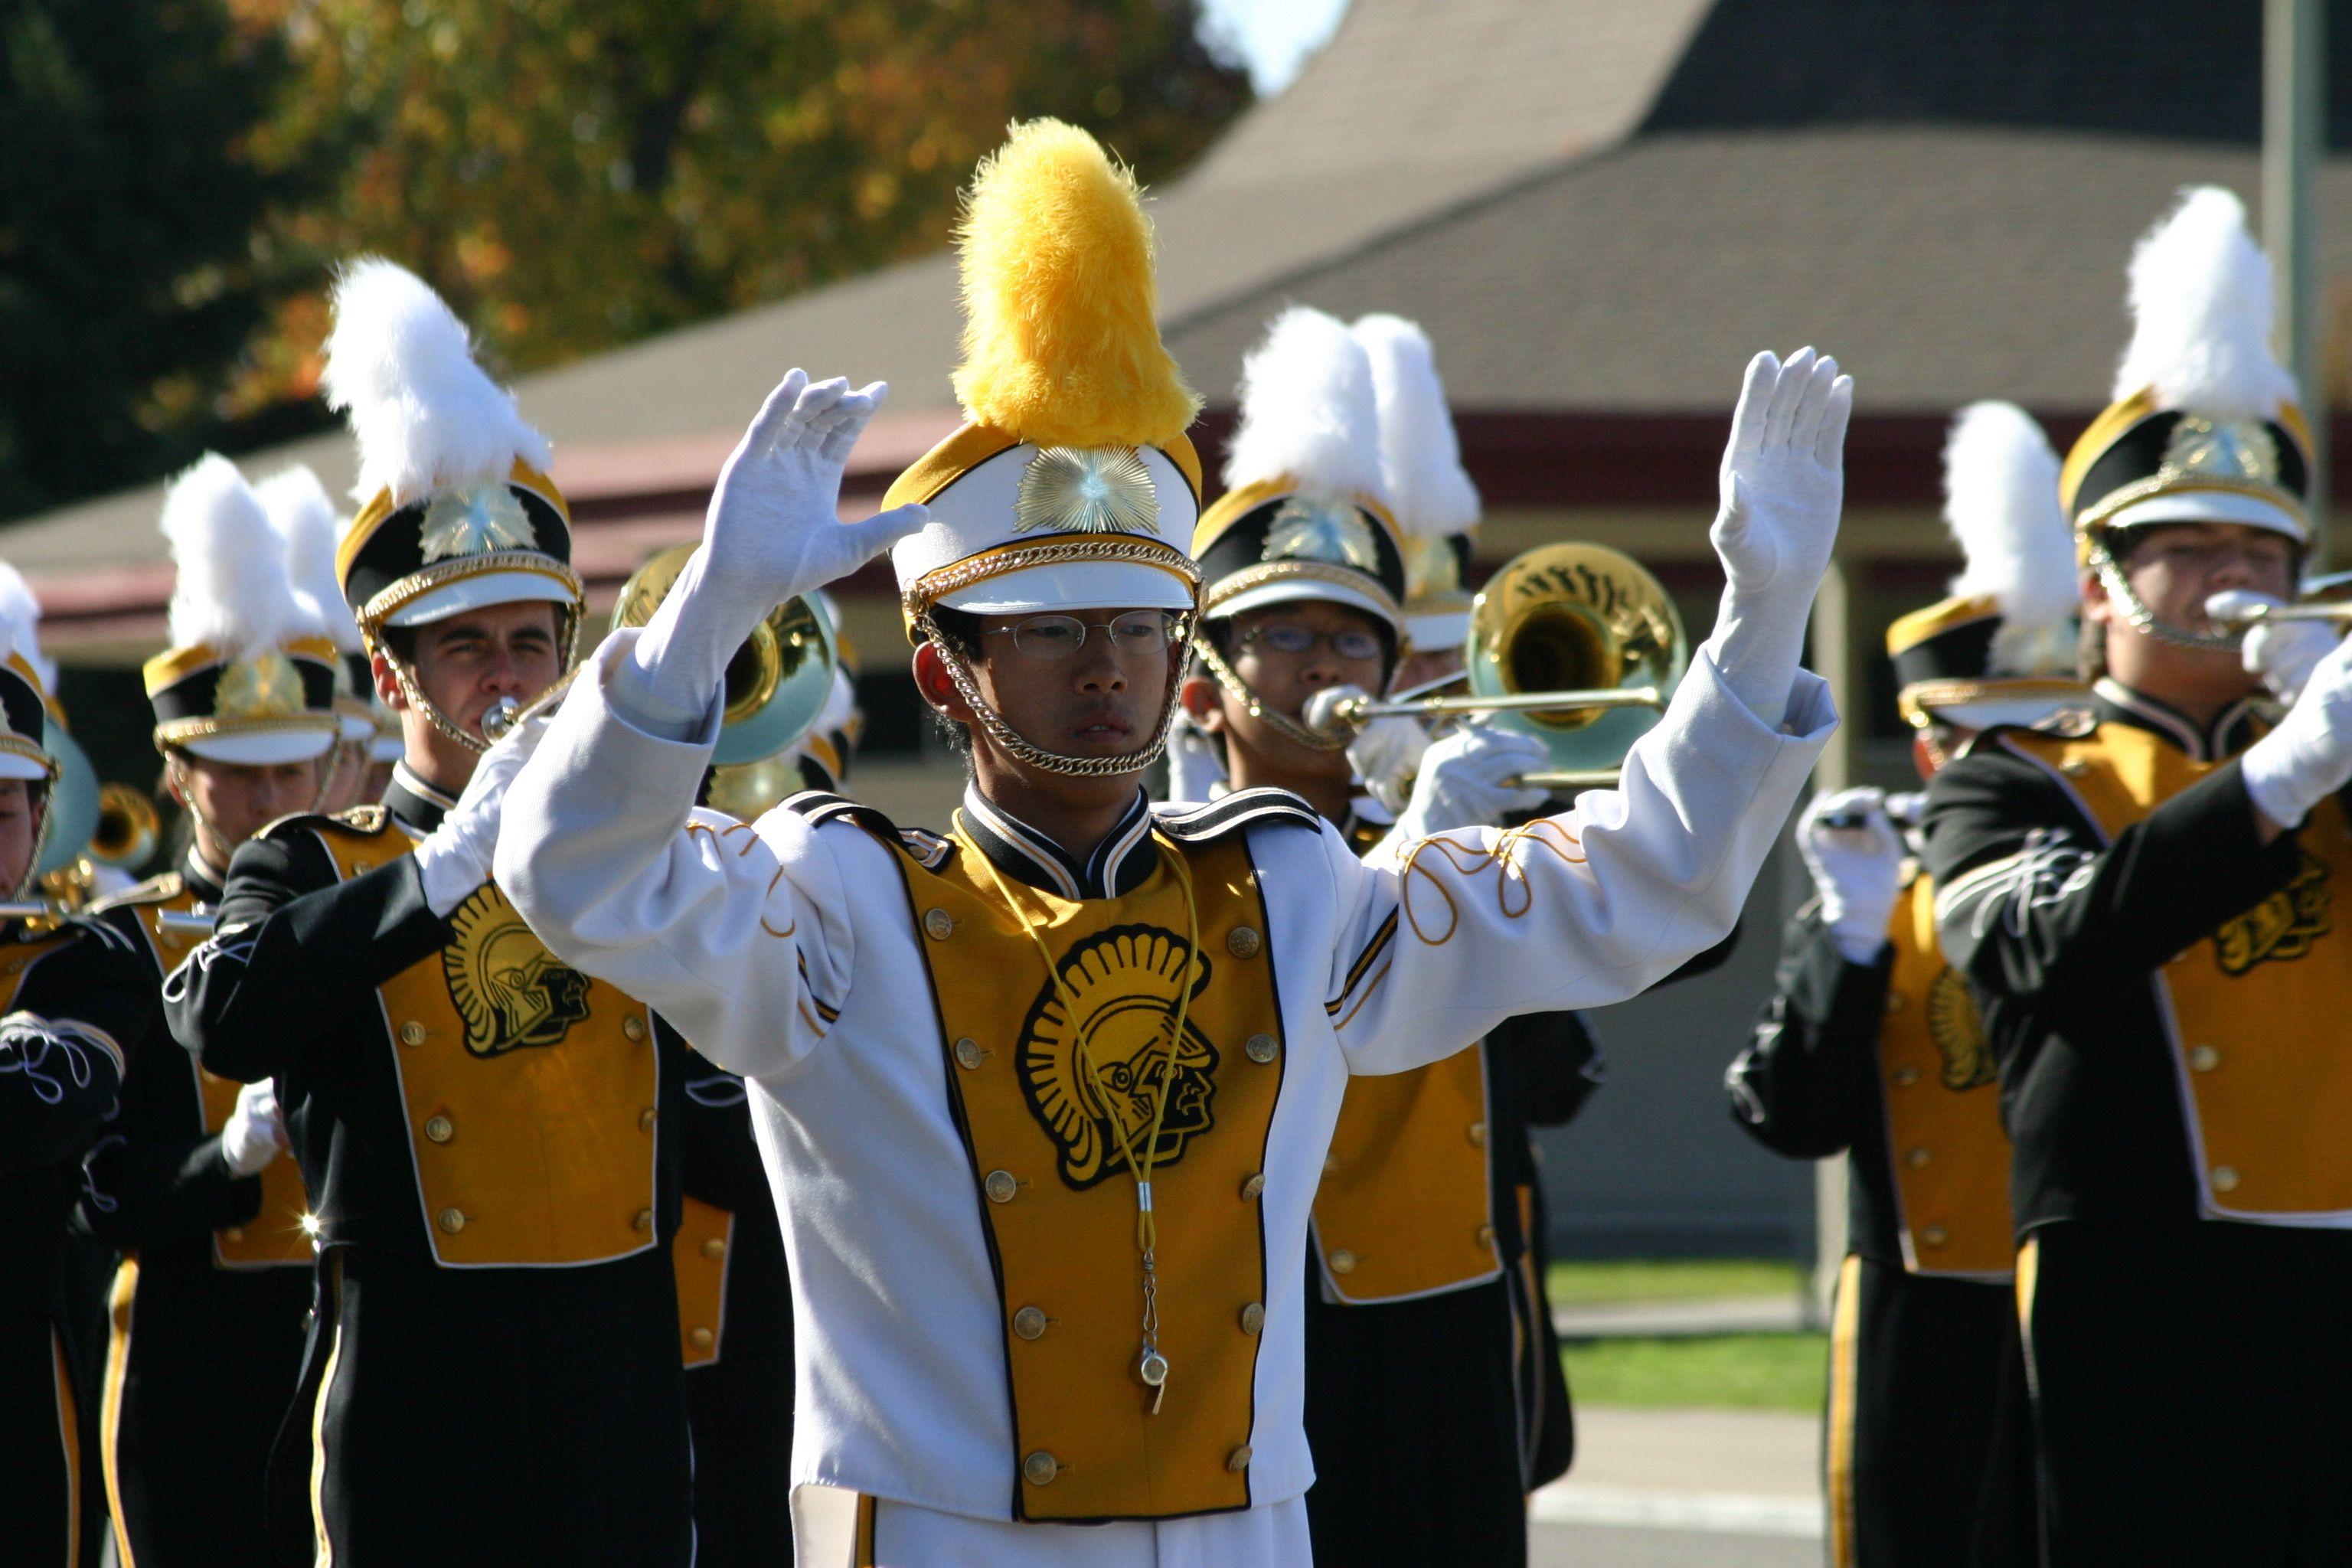 High School Drum Major Uniforms | Mountain View High School